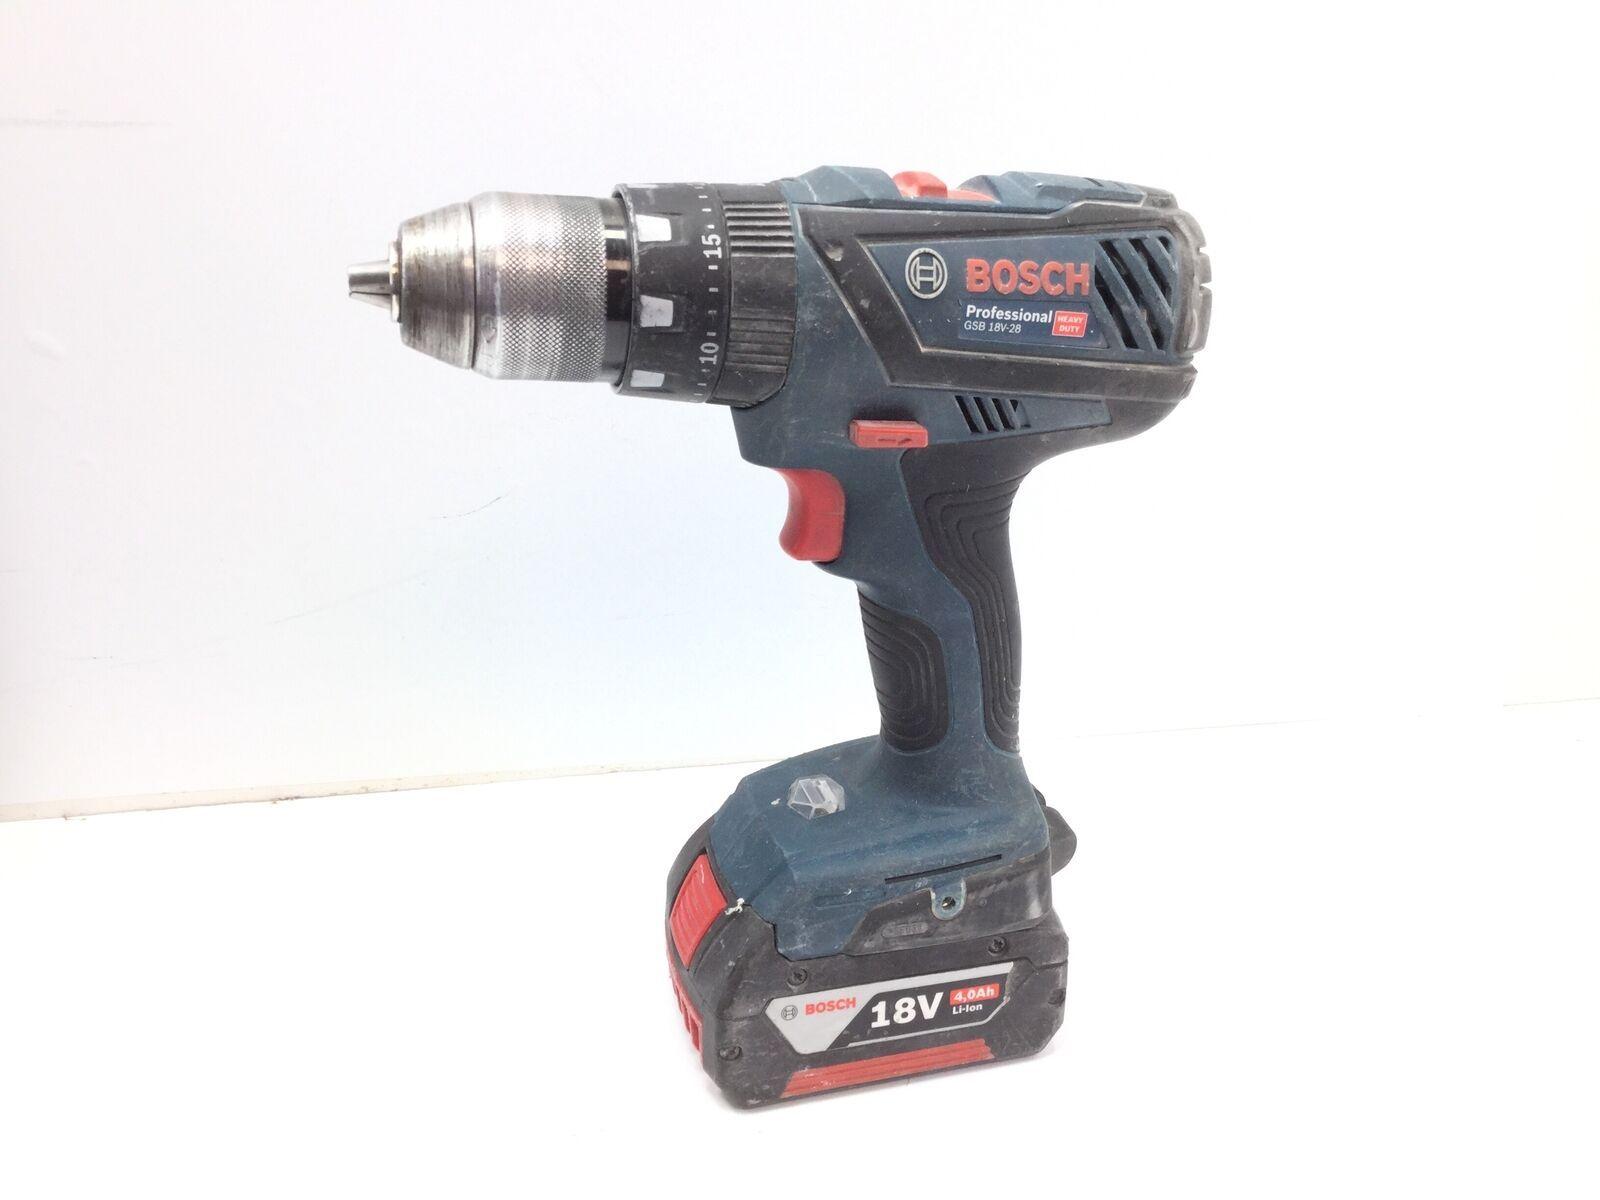 Taladro A Bateria Bosch Azul Gsb 18v 28 5607189 106 50 Taladro